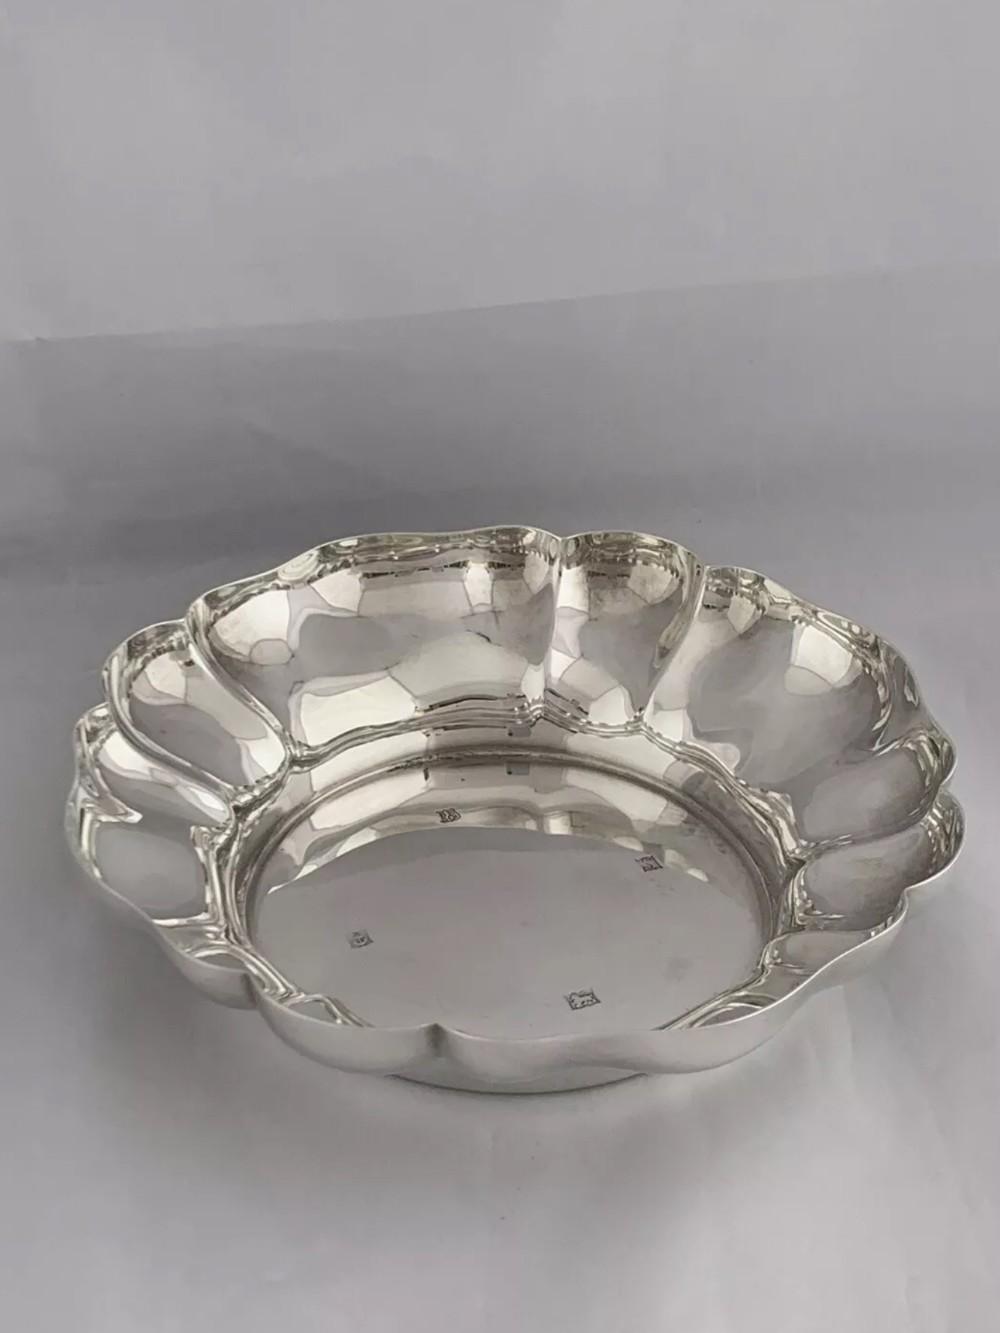 solid silver strawberry dish 1967 birmingham heavy sterling silver